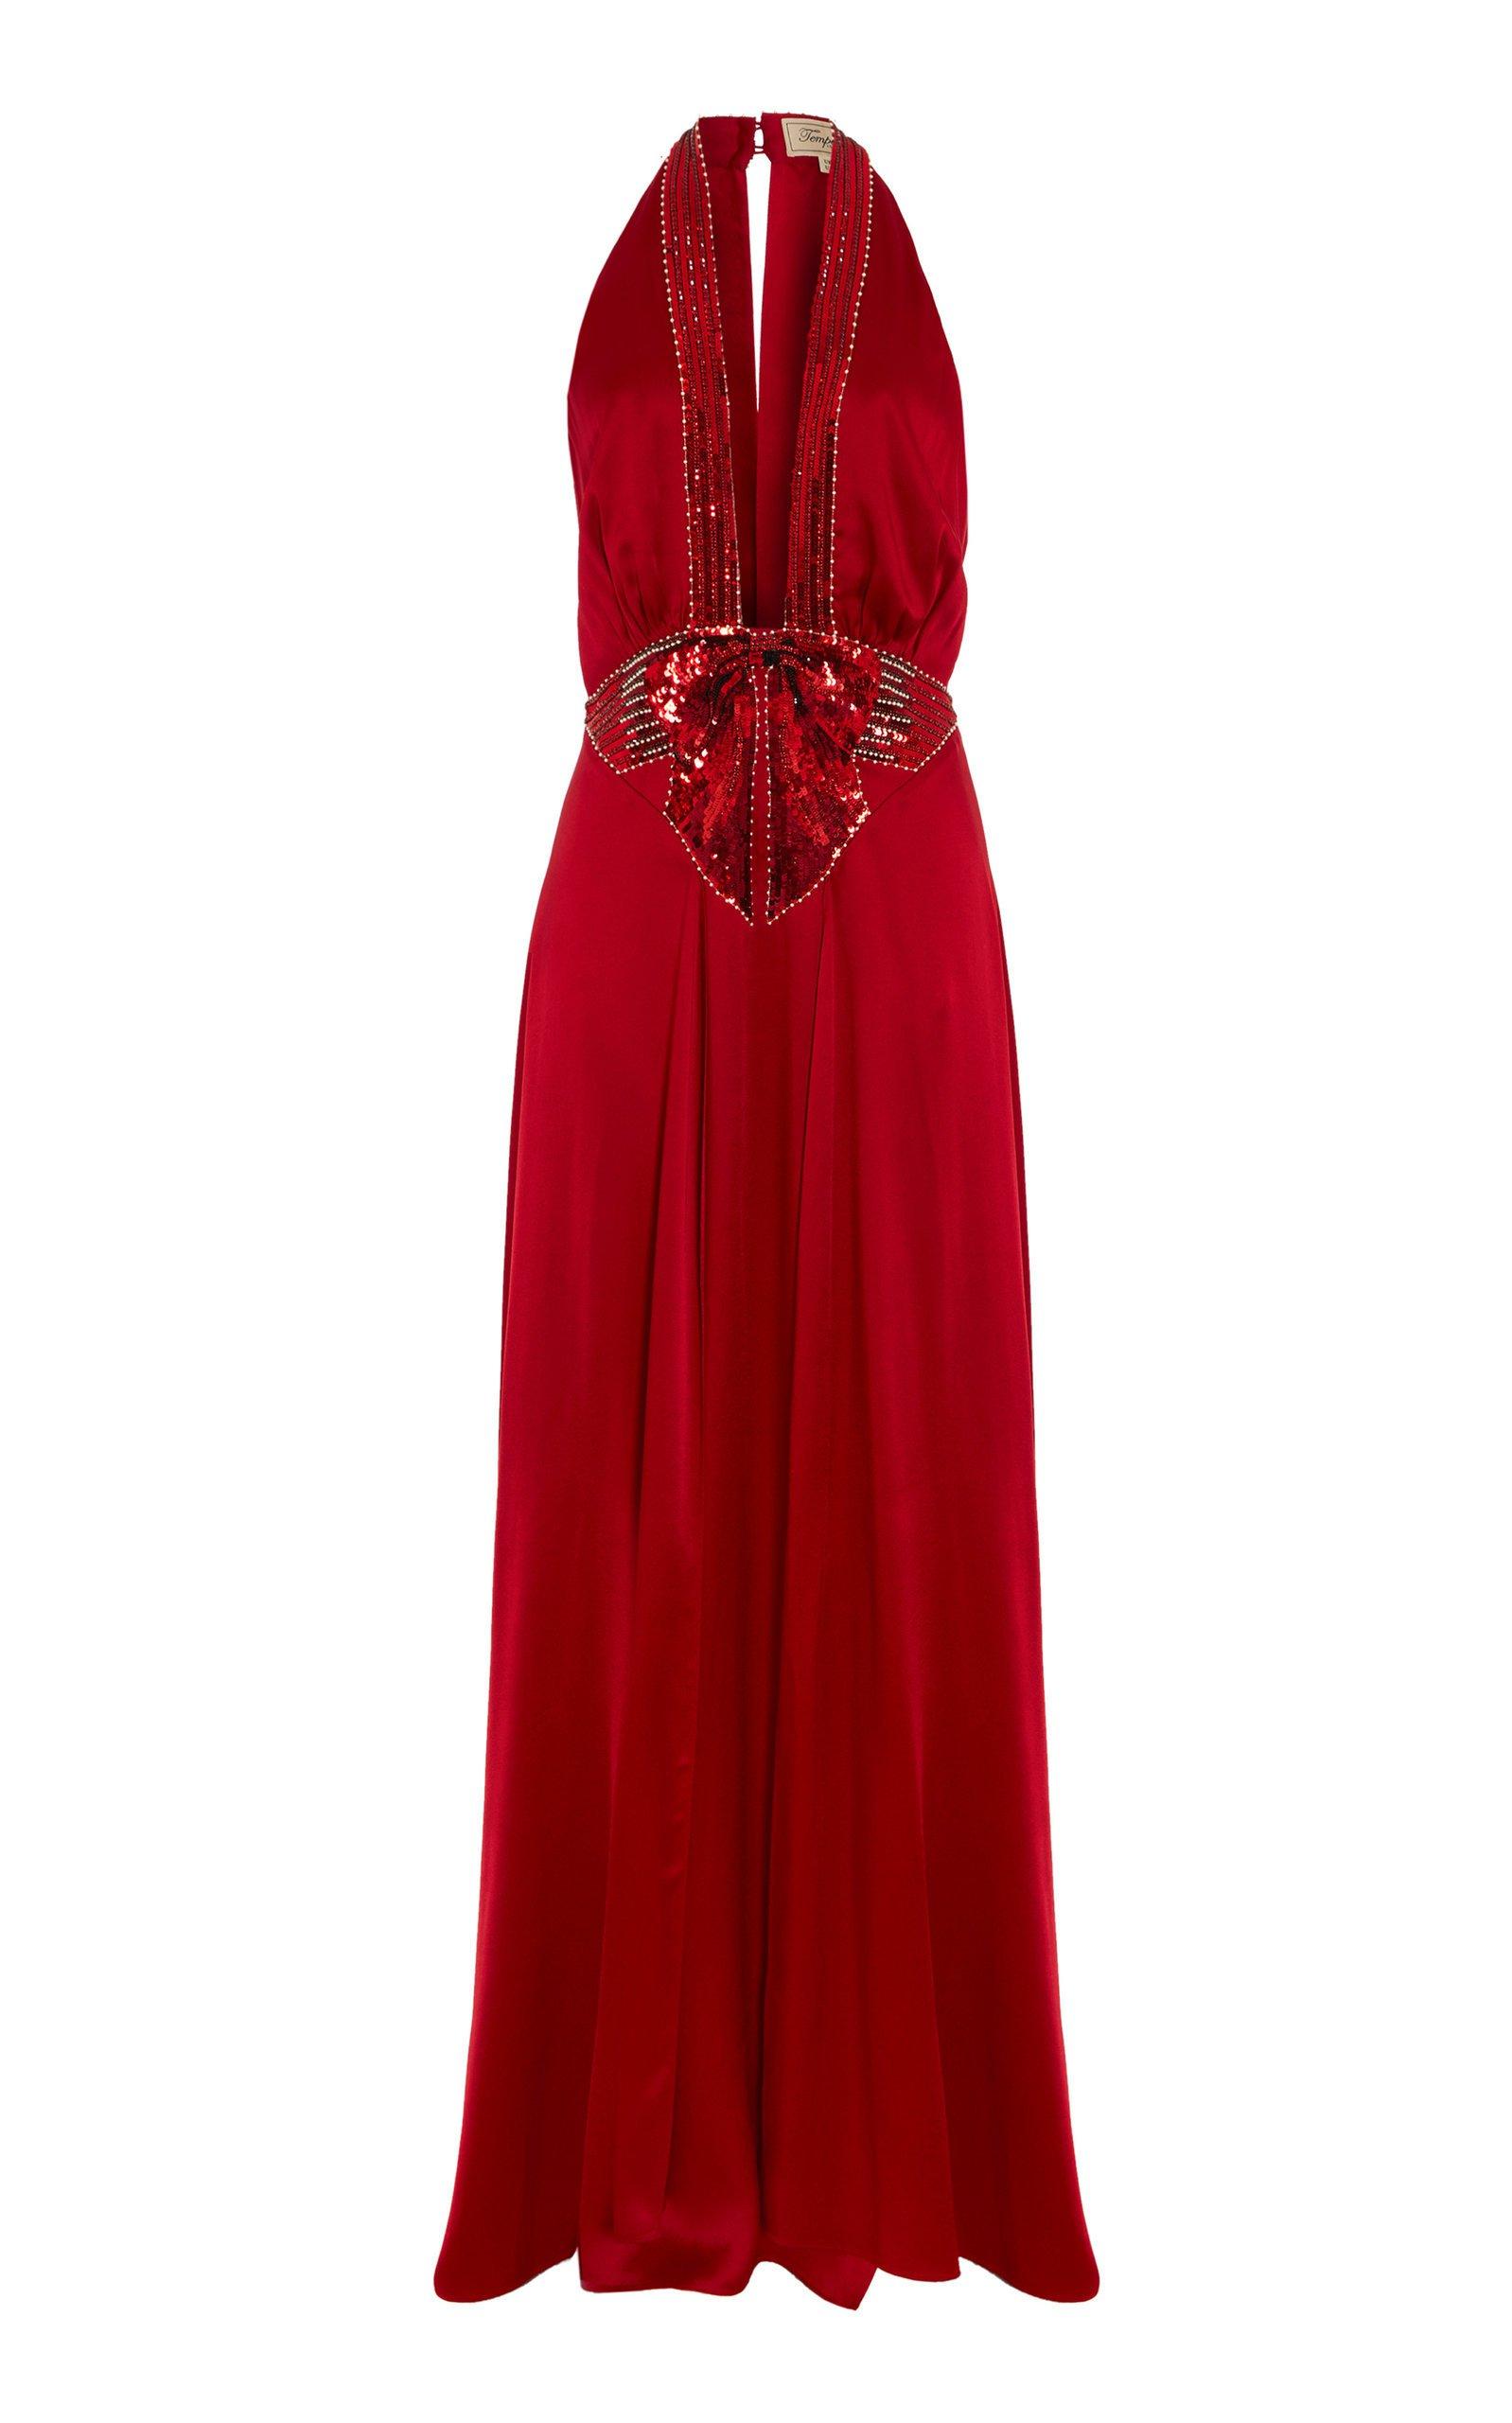 Temperley London Lolita Halter Neck Dress